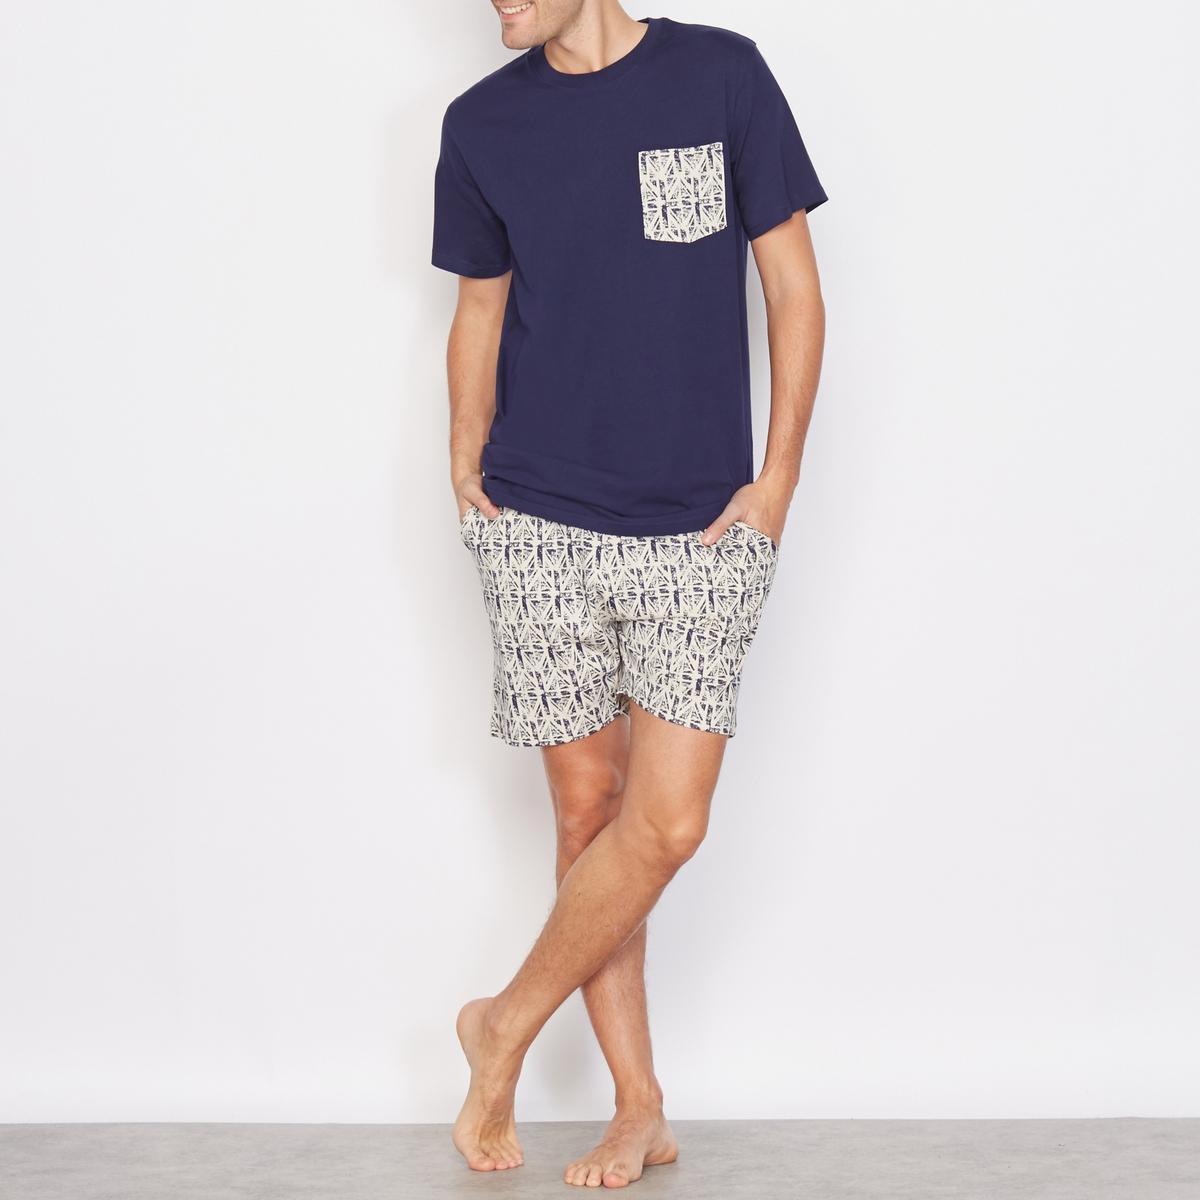 Пижама с шортами, 100% хлопкаСостав и описание:- Материал: 100% хлопка.- Марка: LES PETITS PRIX.Уход: машинная стирка при 30°C.<br><br>Цвет: синий морской